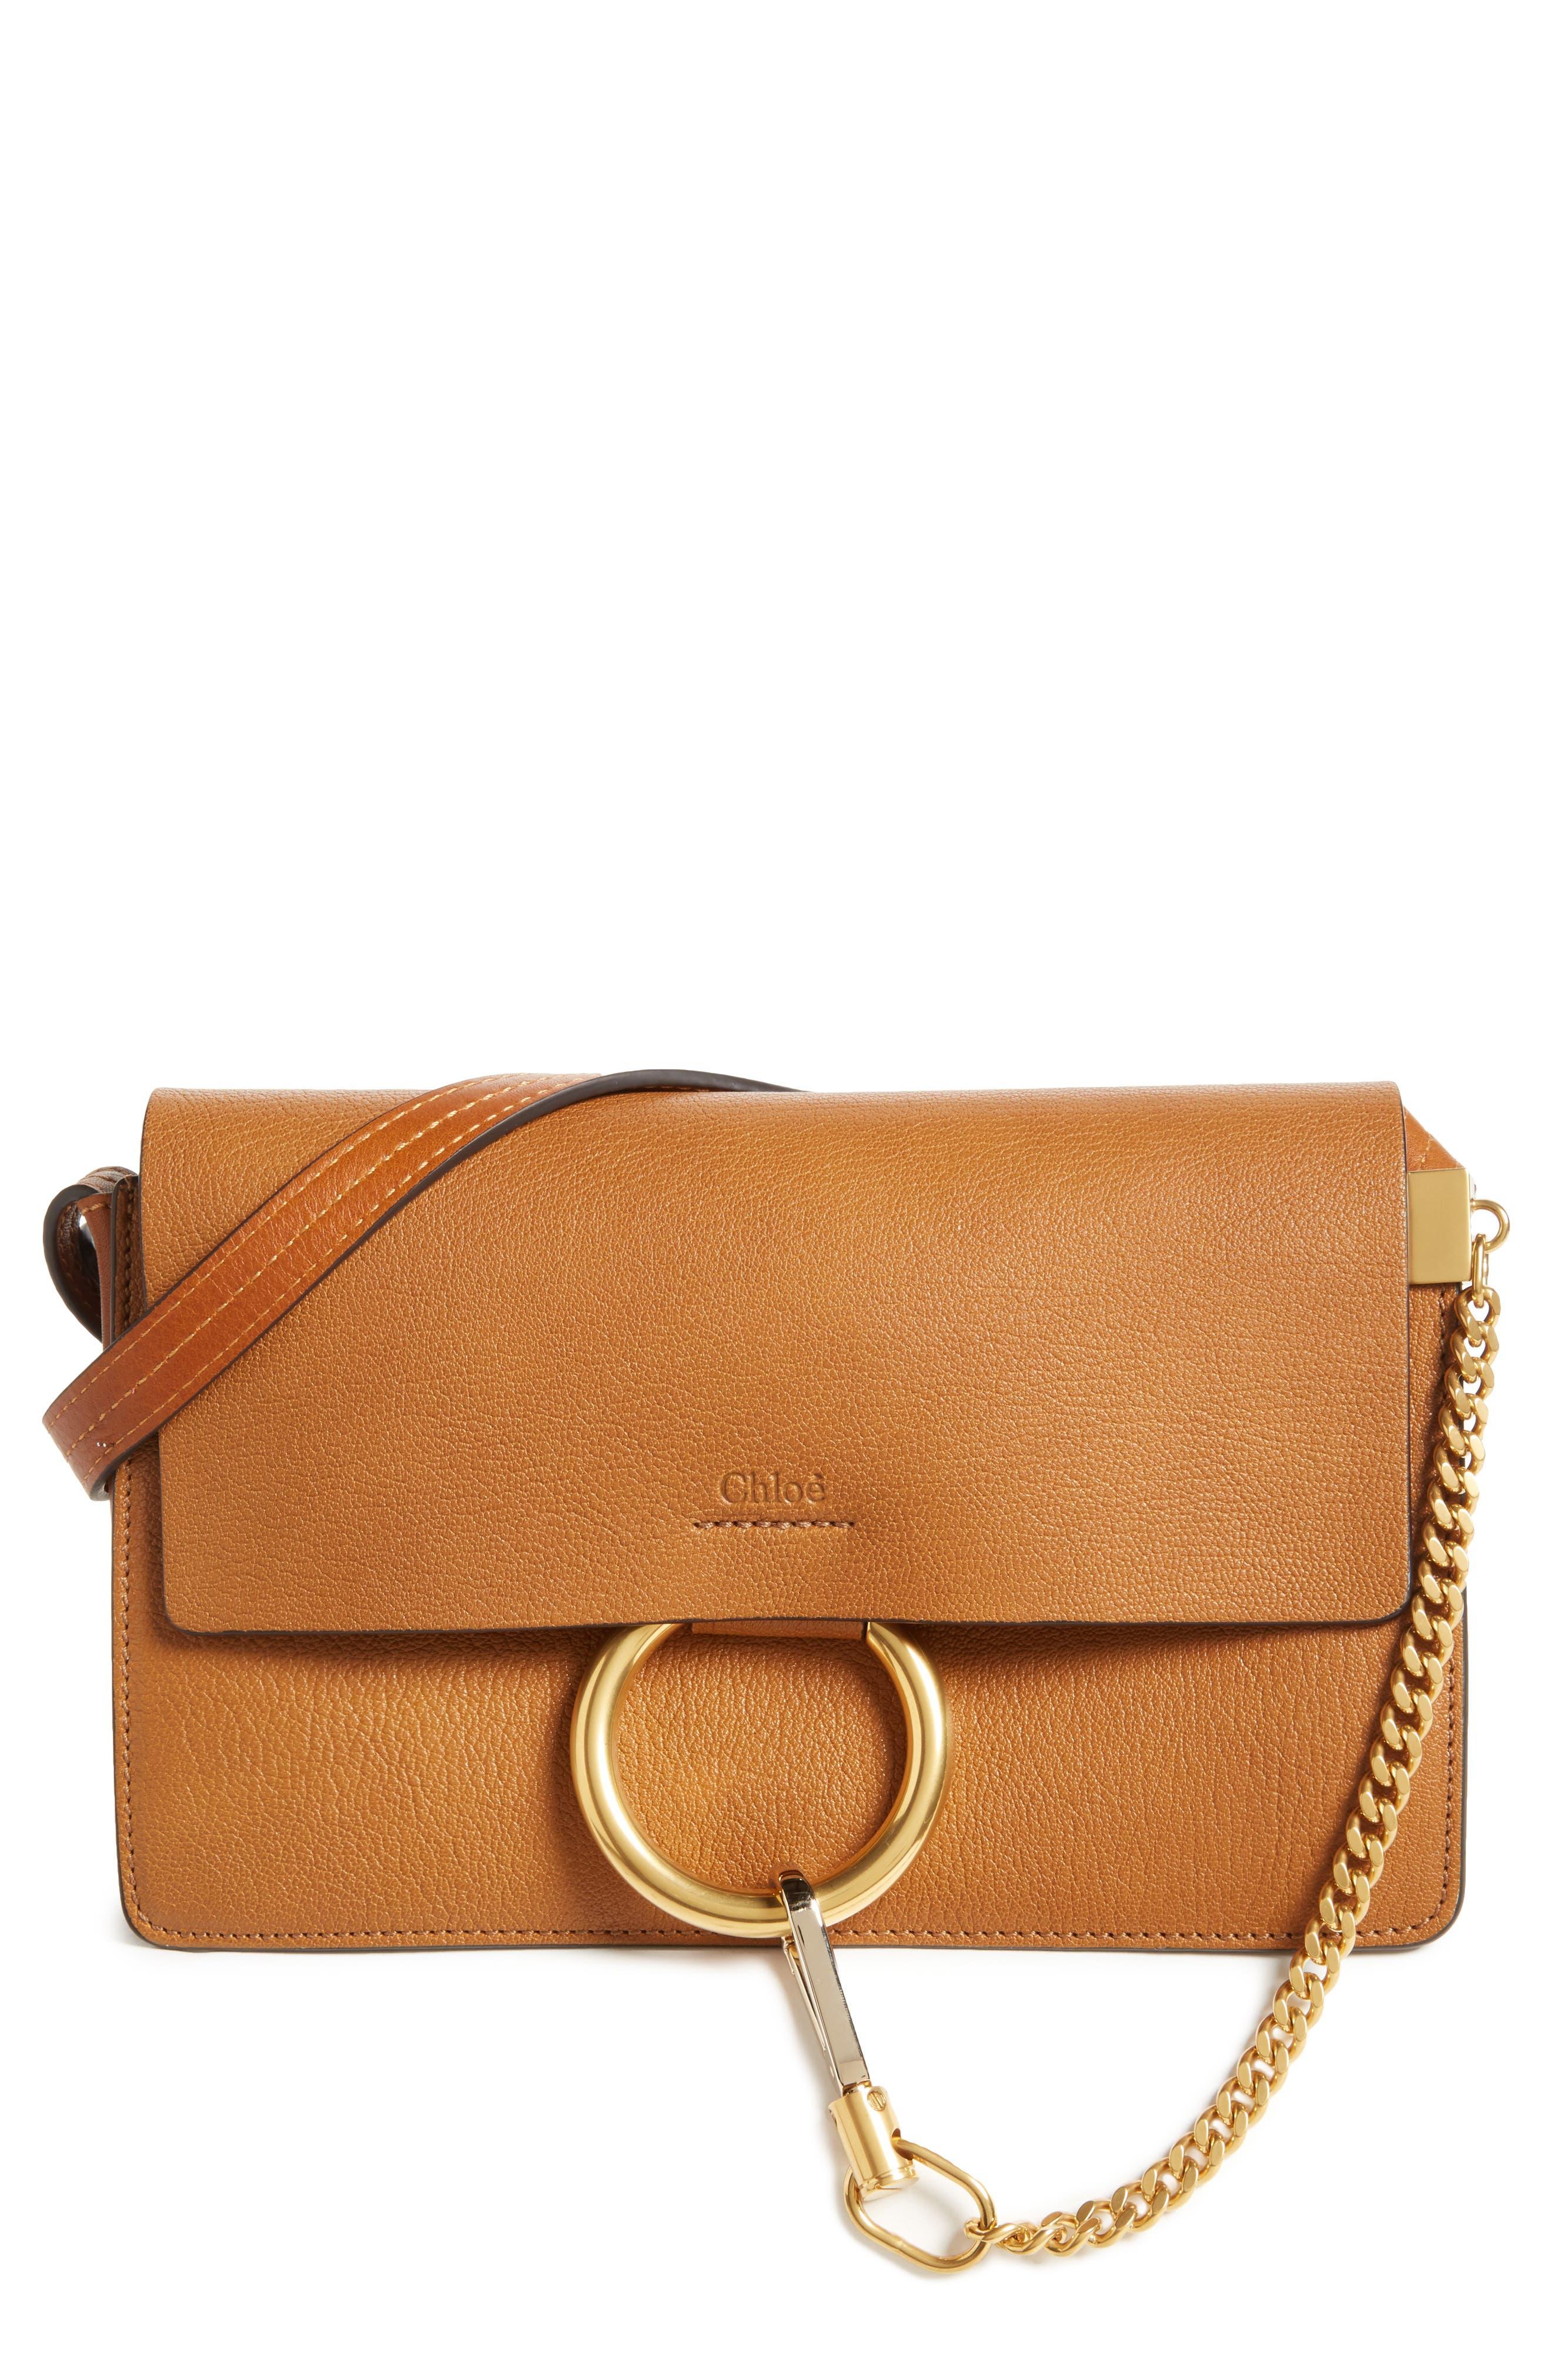 Chloé Small Faye Goatskin Leather Crossbody Bag